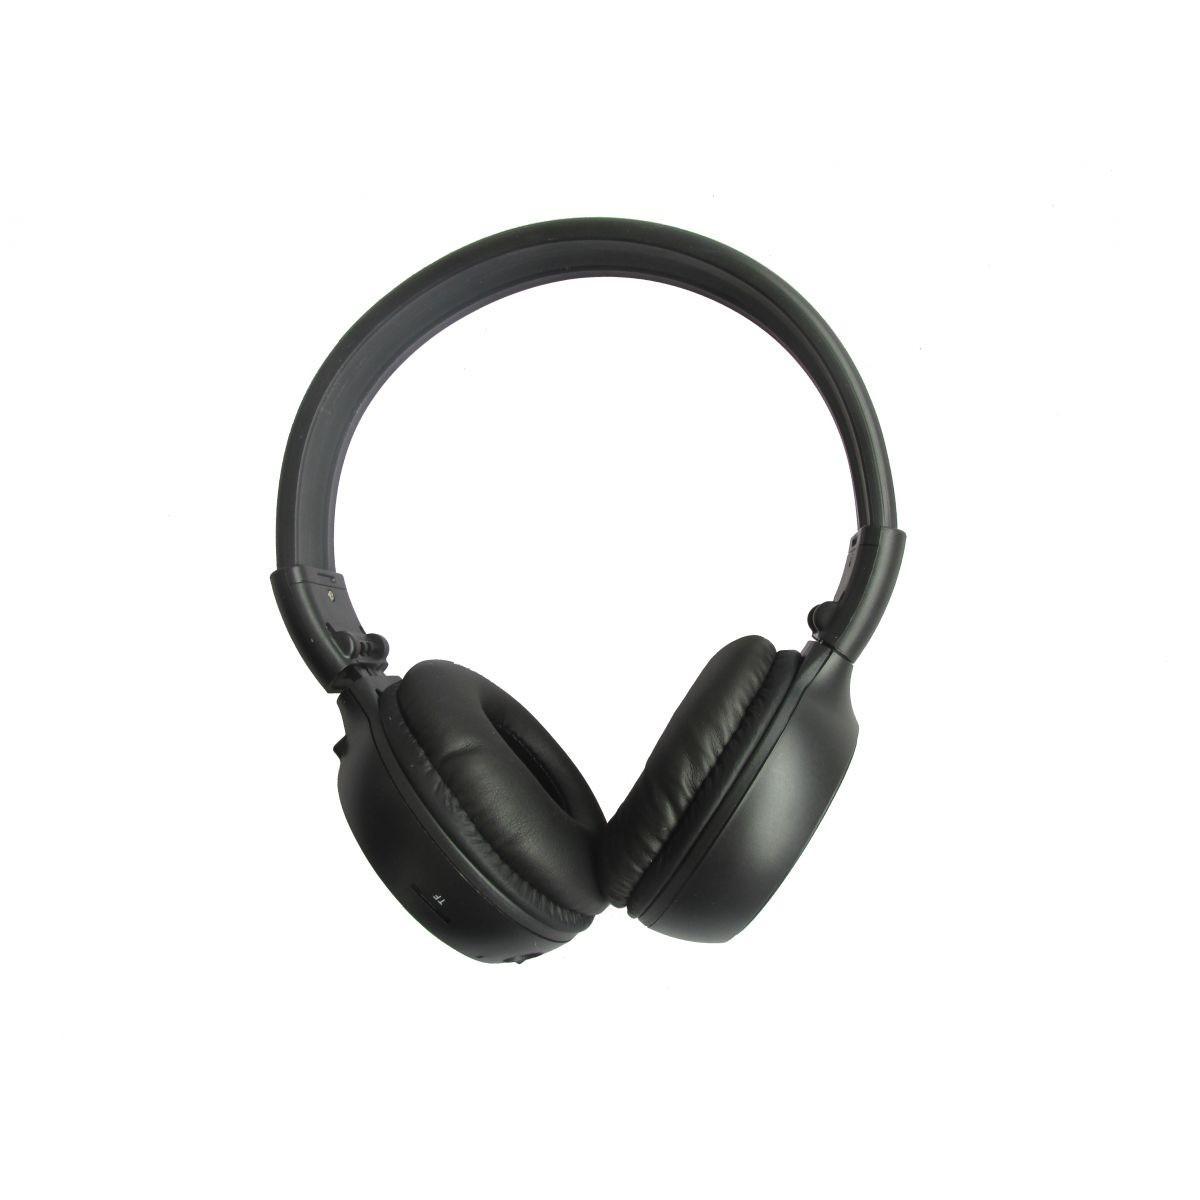 Apple wireless headphones genuine - apple wireless headphones skin kit